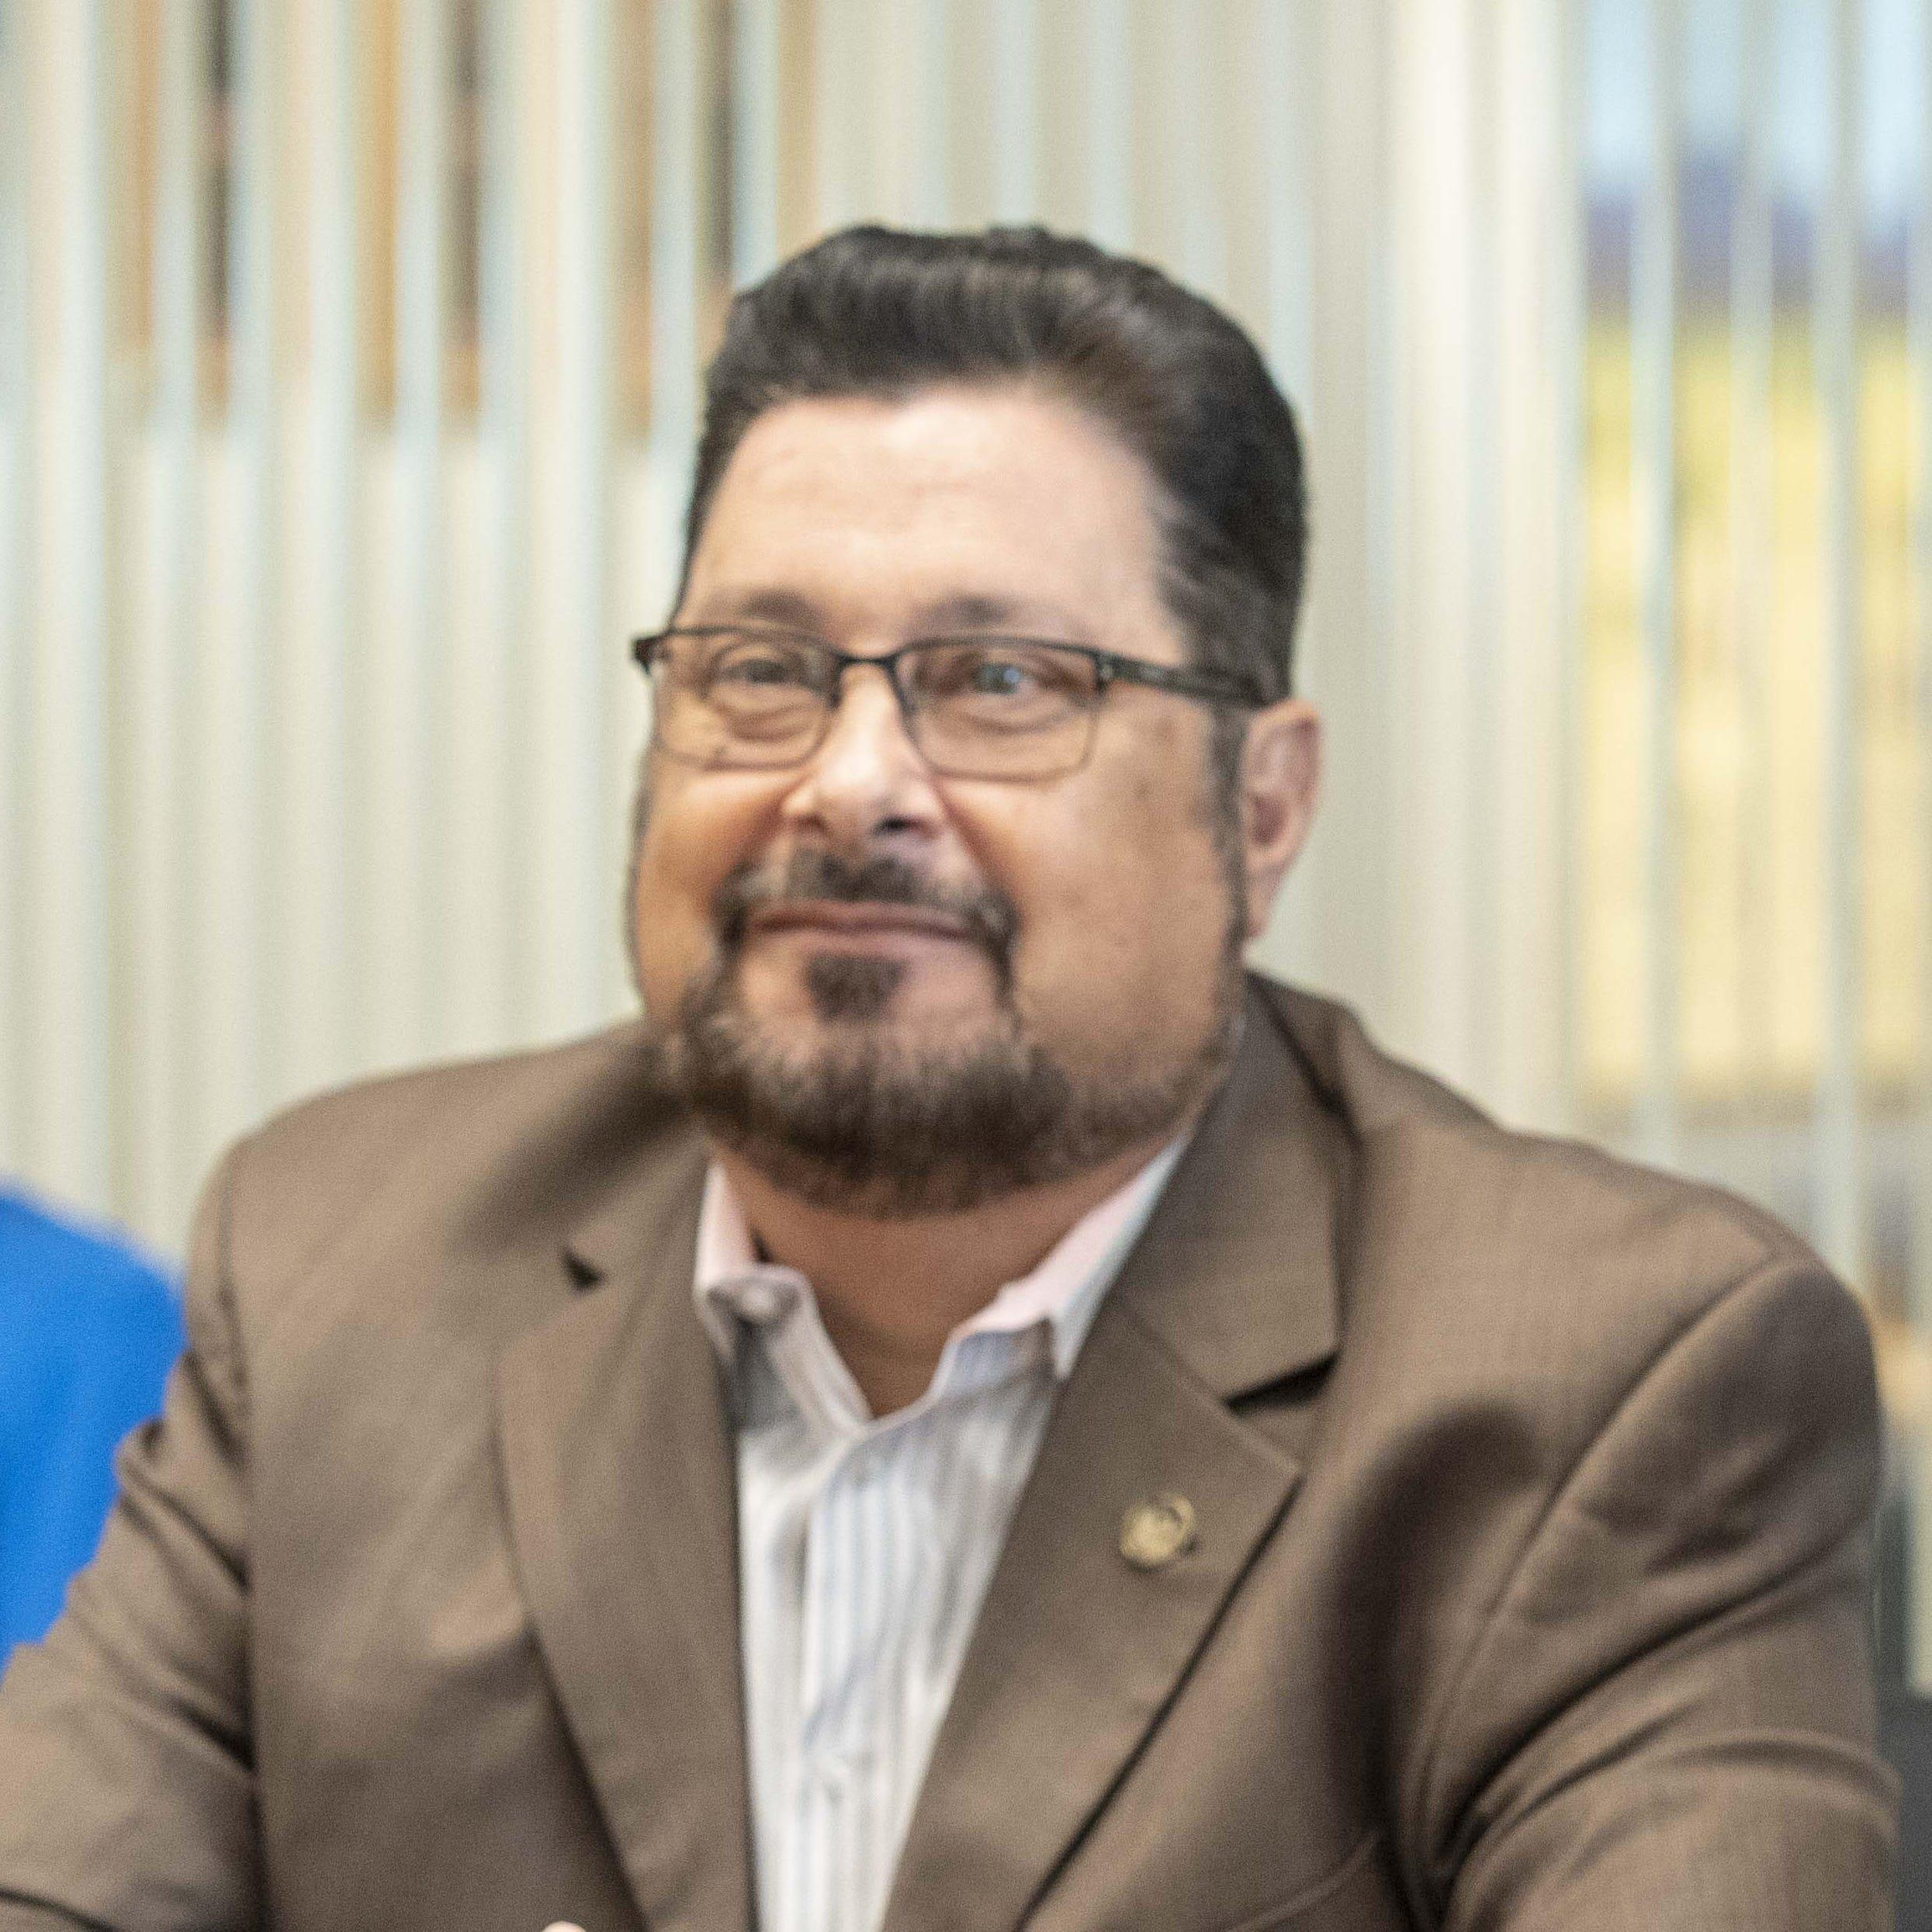 Recall of Phoenix Councilman Michael Nowakowski heats up